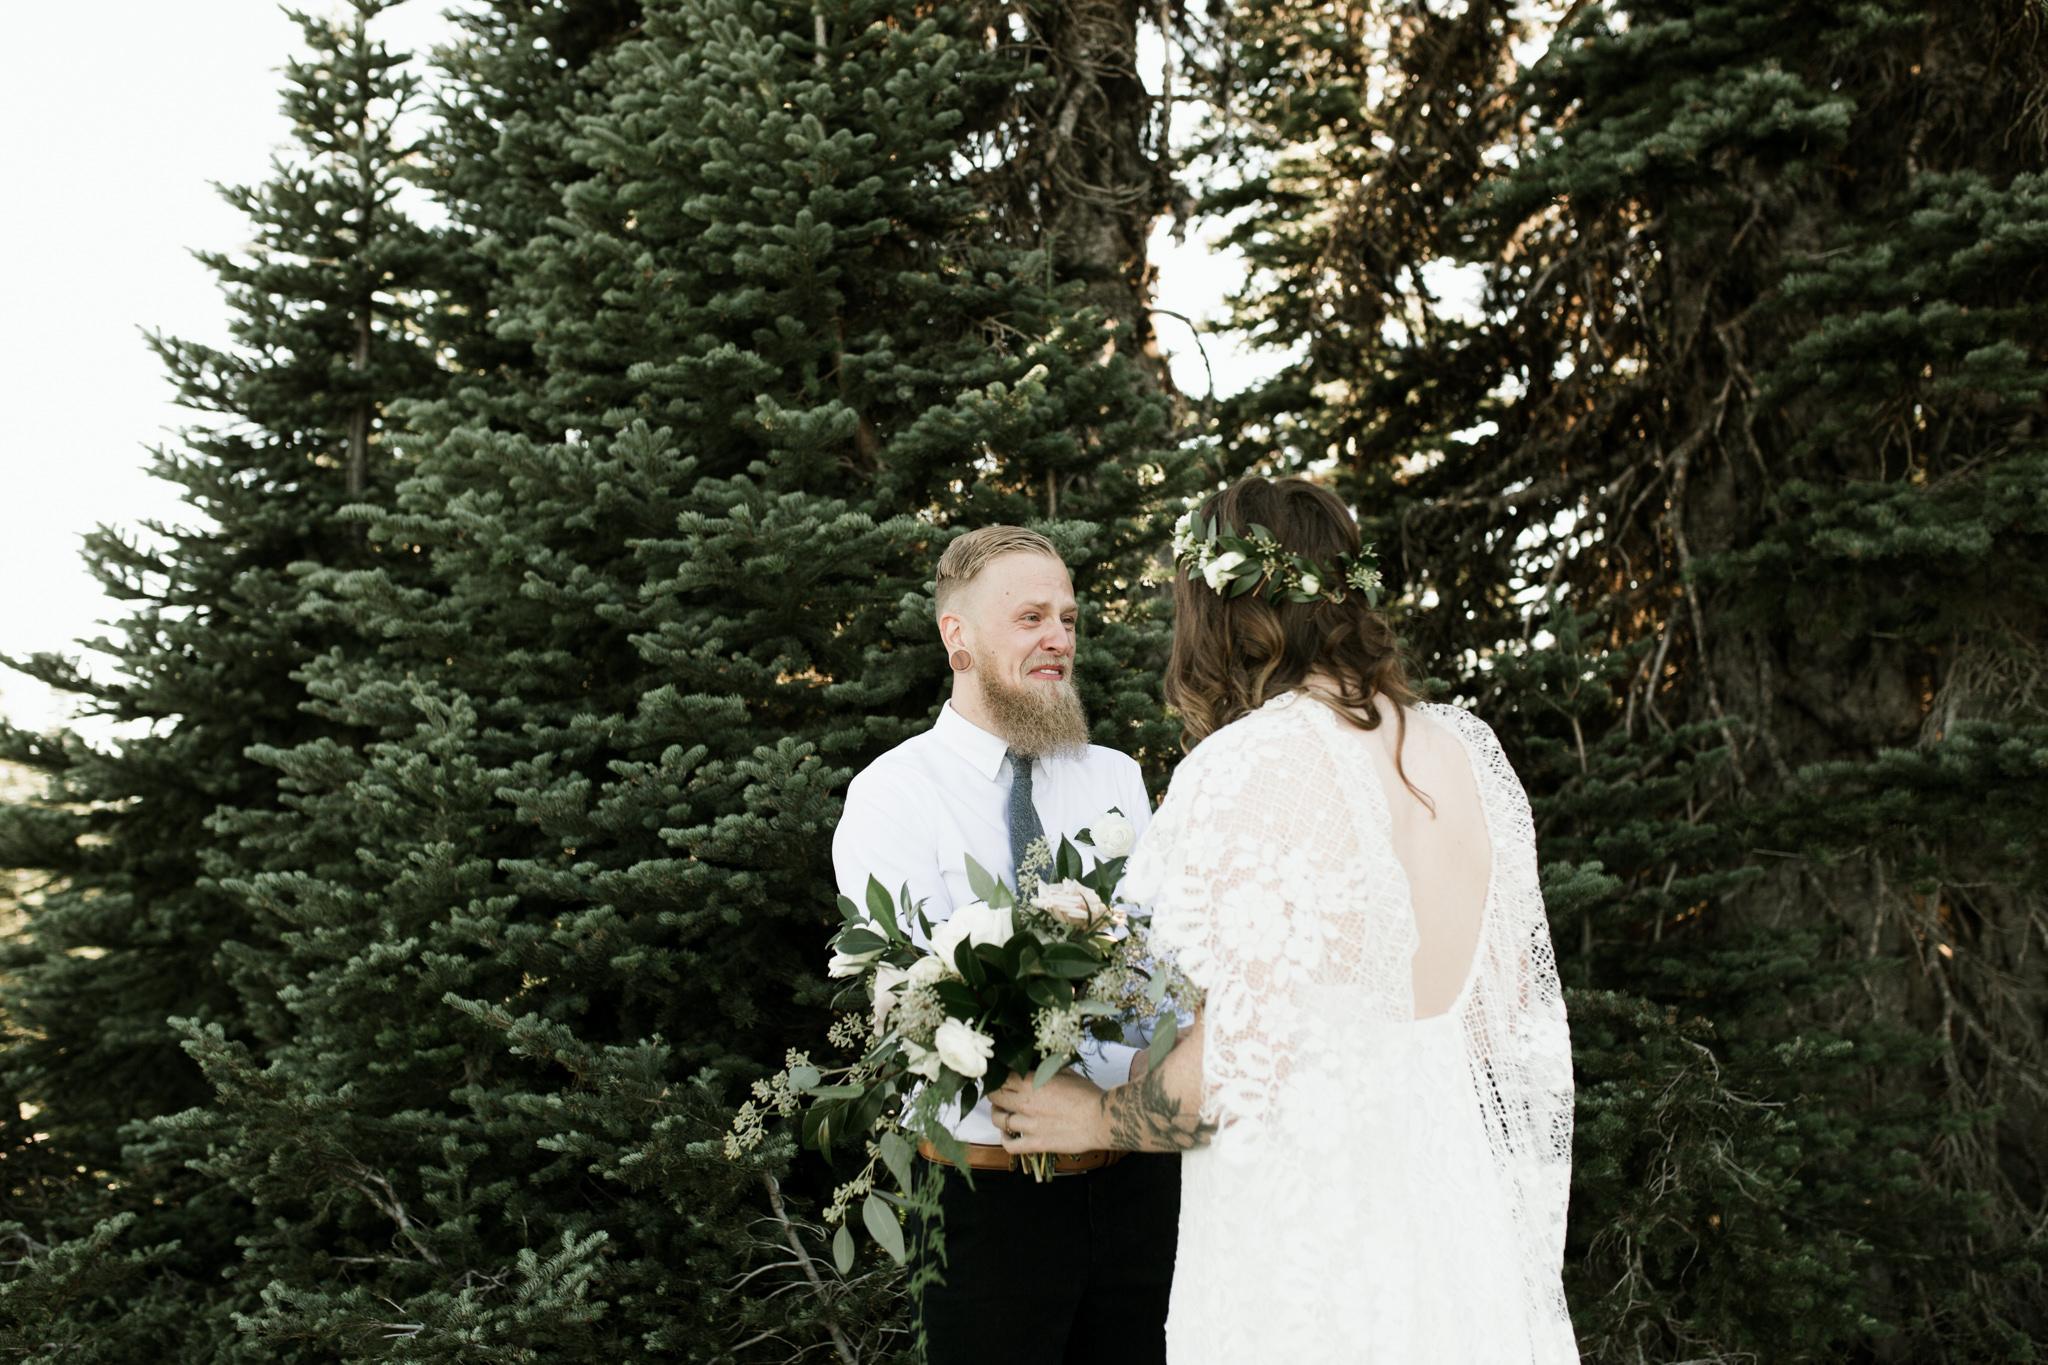 Jesse-Kasie-Hurricane-Ridge-Wedding-5.jpg